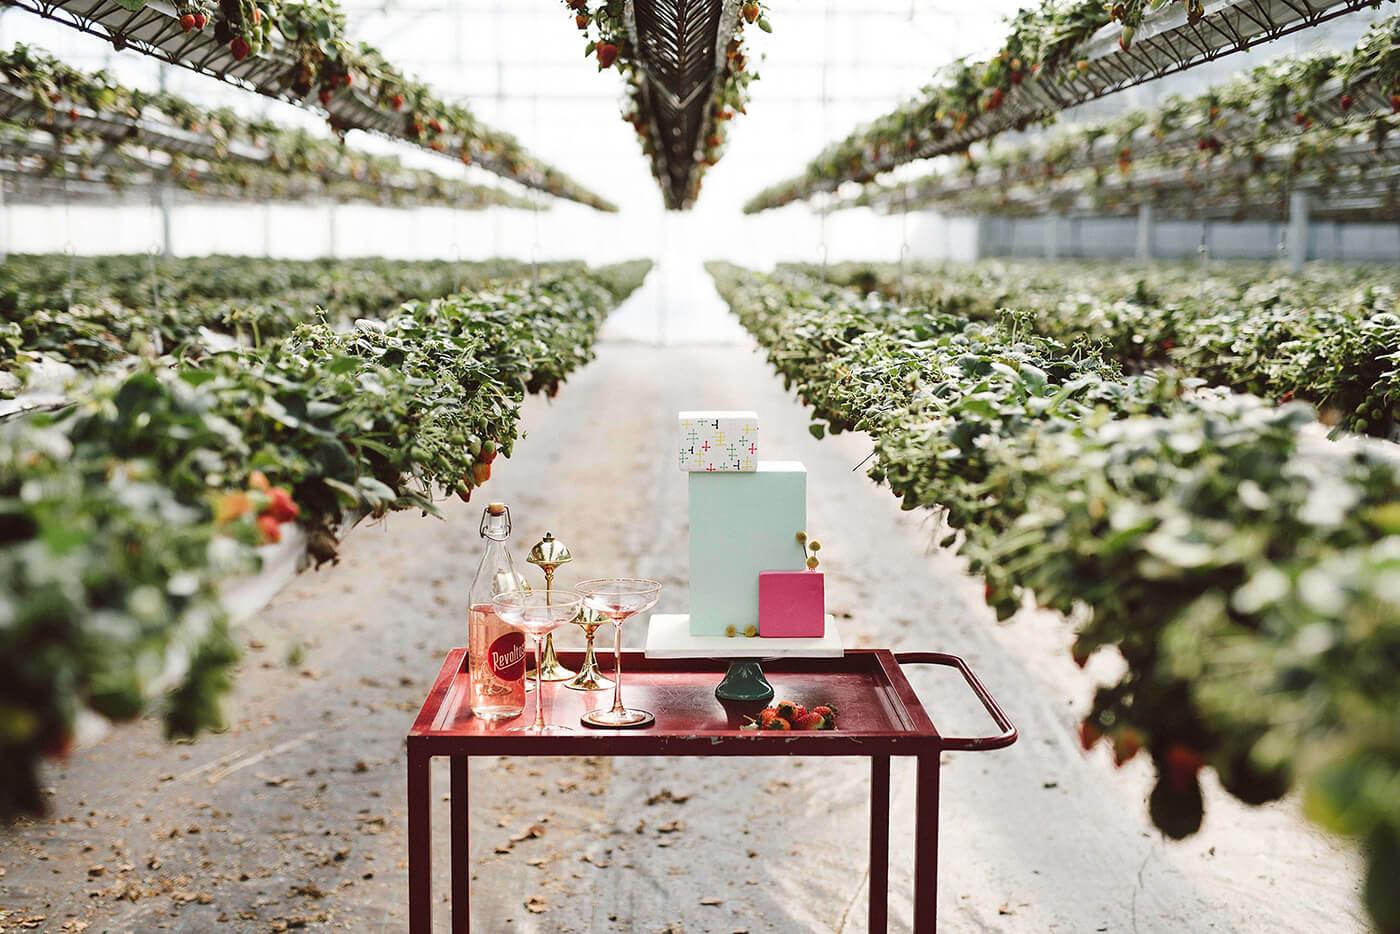 roma-organizacao-eventos-editorial-mid-century-modern-wedding-in-a-strawberry-field-26